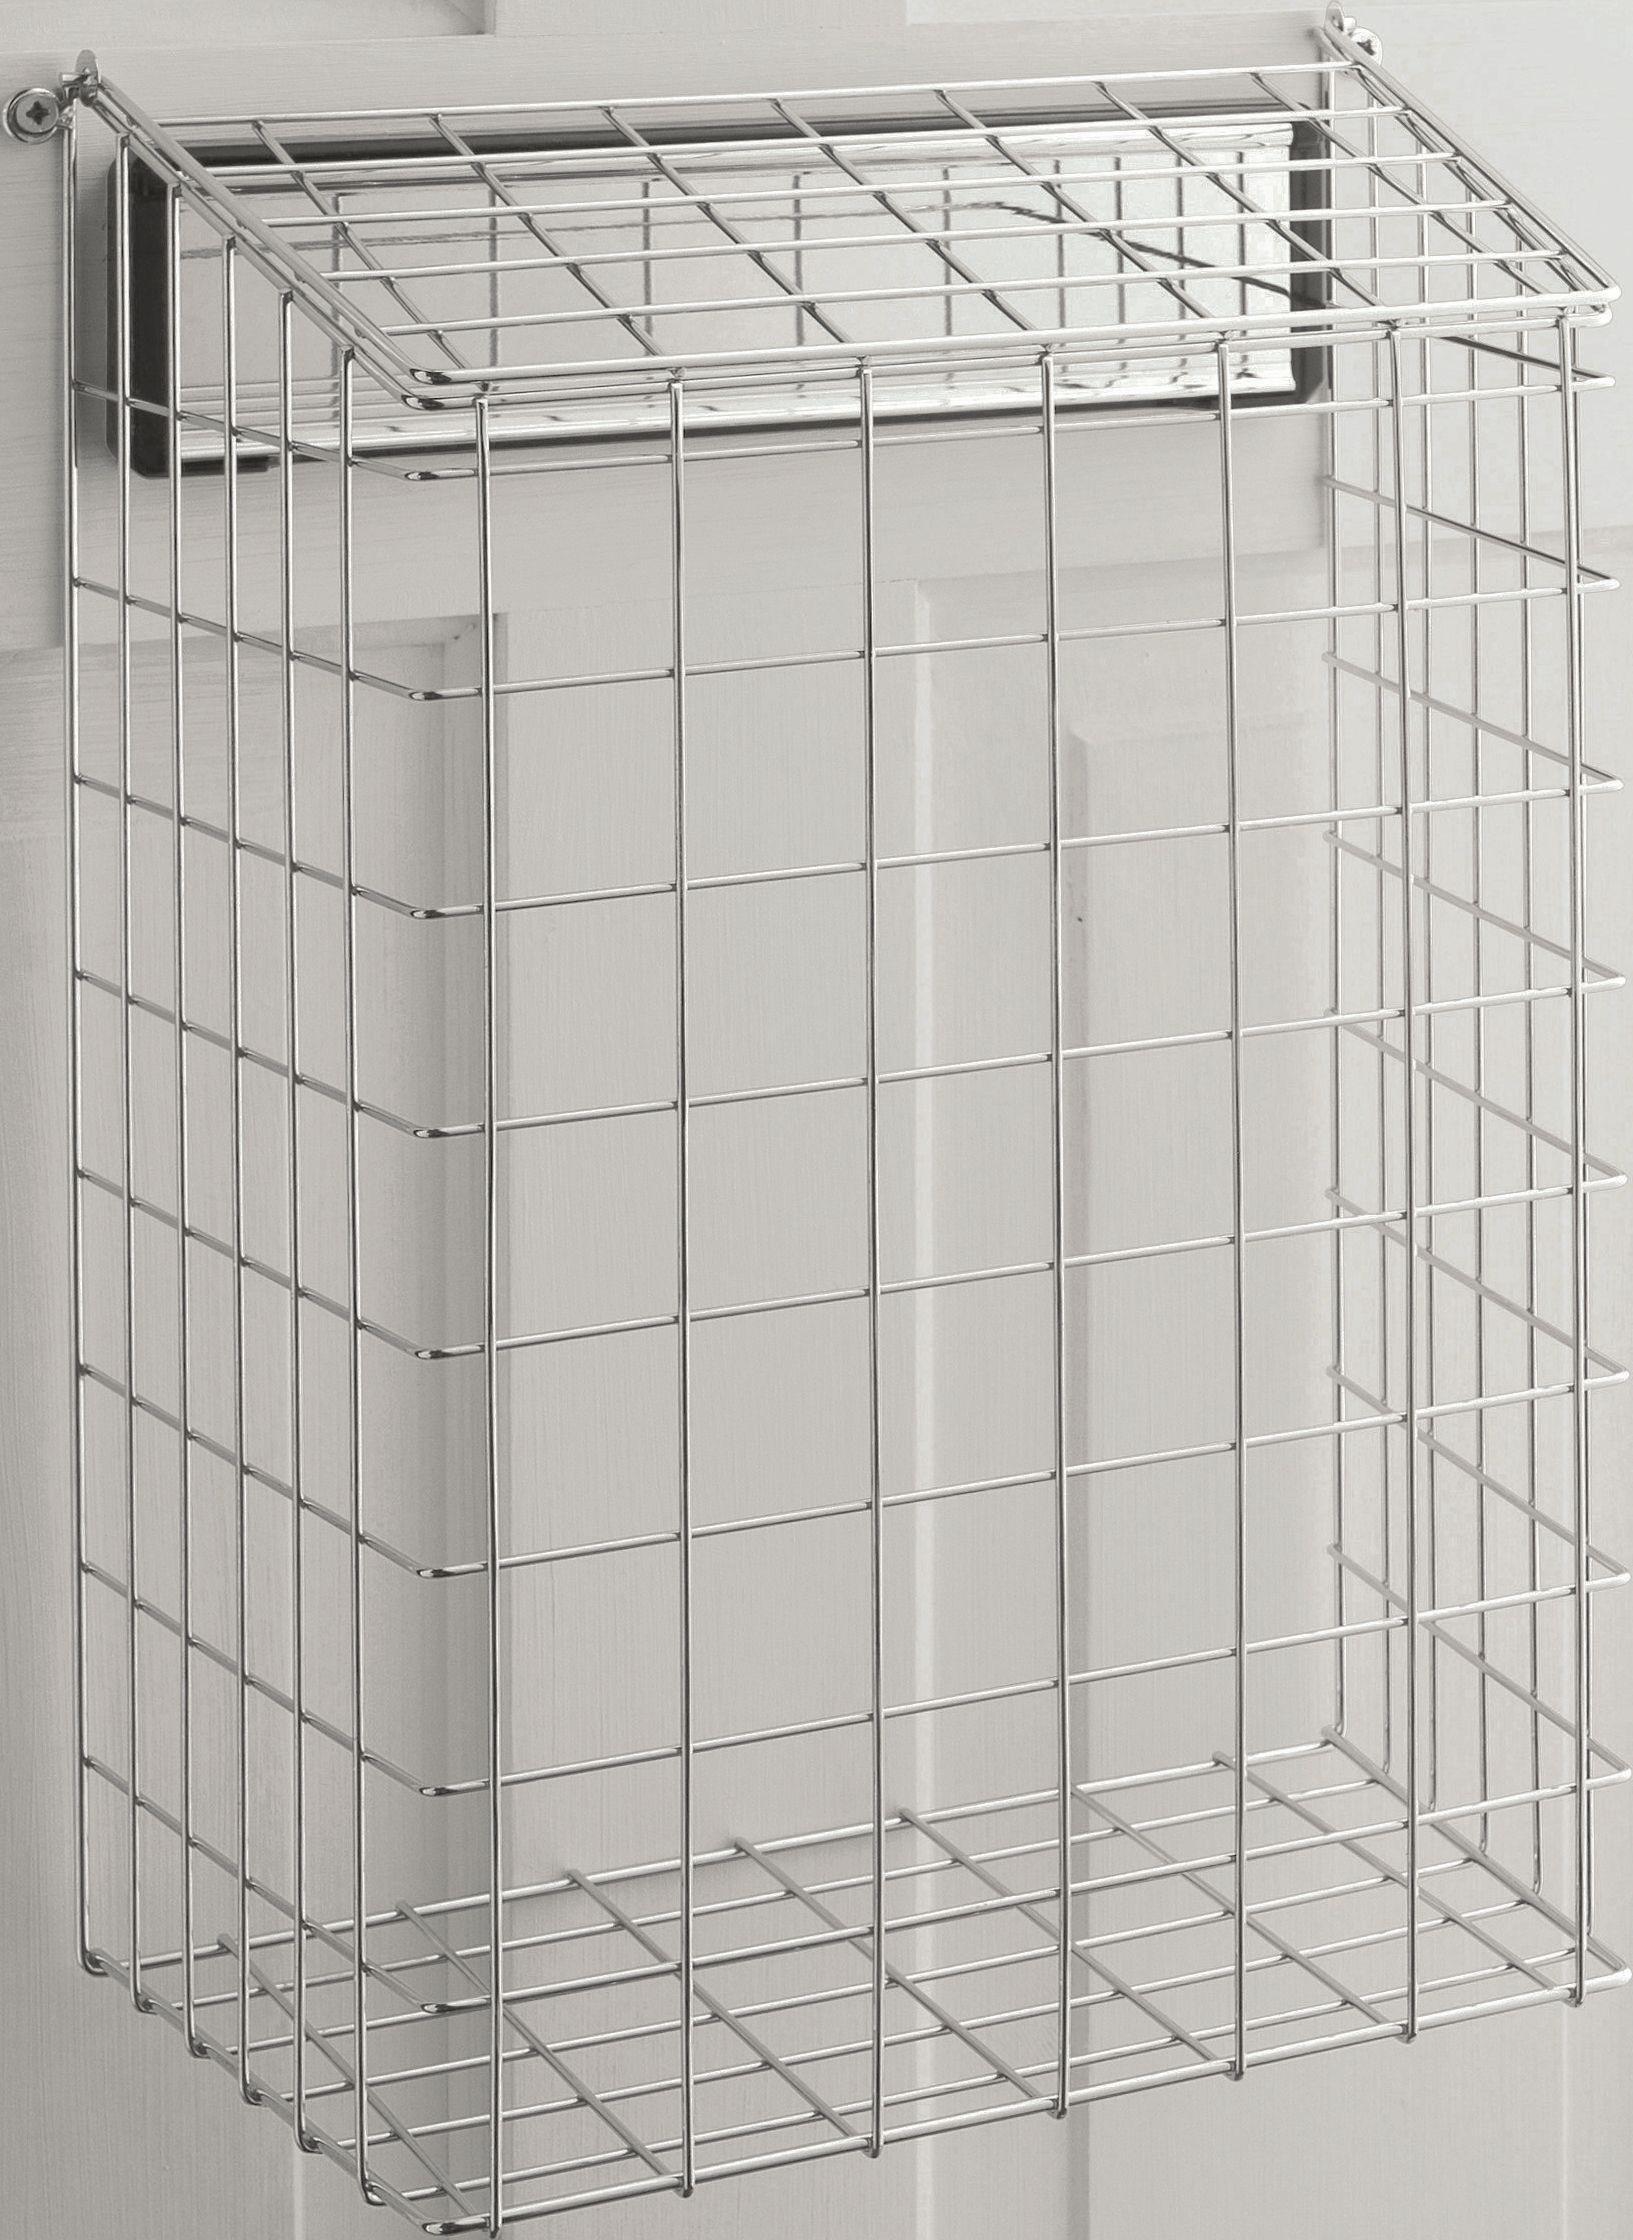 door cages letters letterbox cage door mounted mail. Black Bedroom Furniture Sets. Home Design Ideas